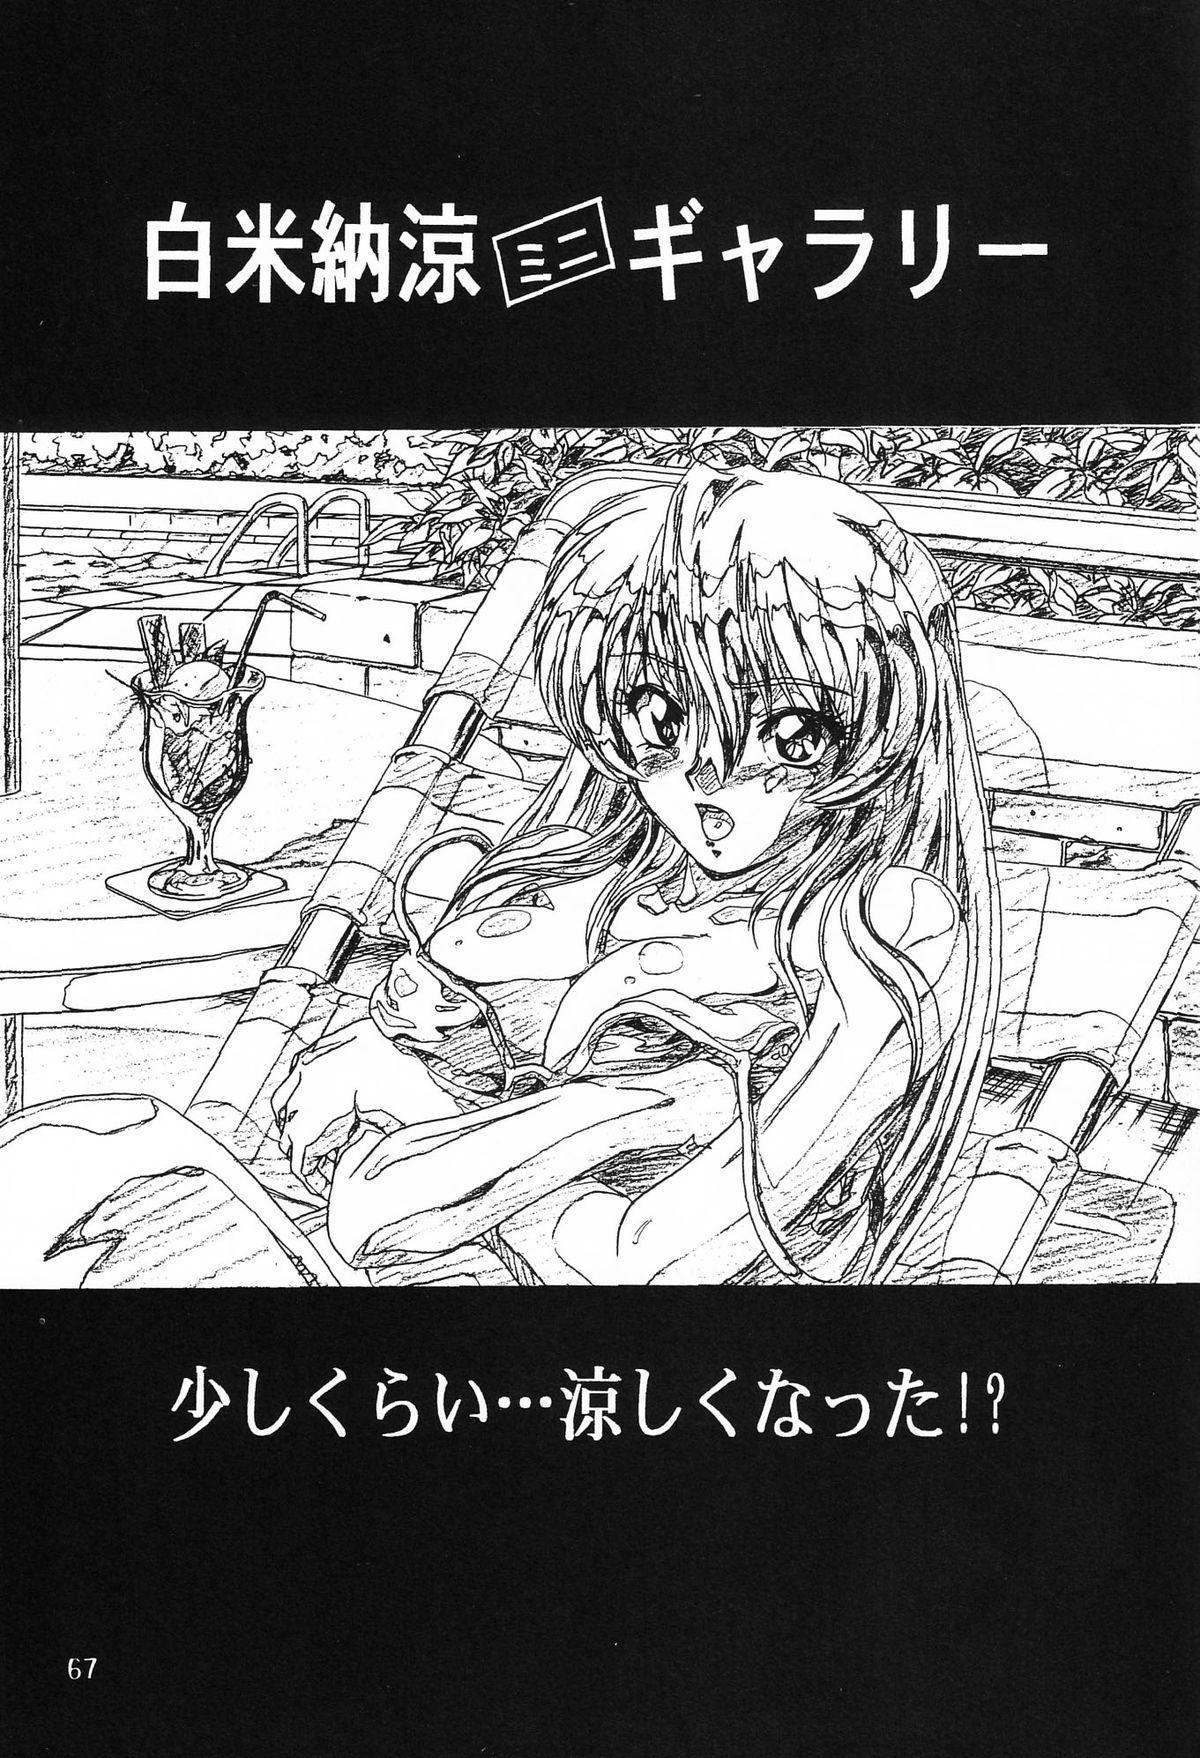 Henrei-kai '98 Natsu SPECIAL 66